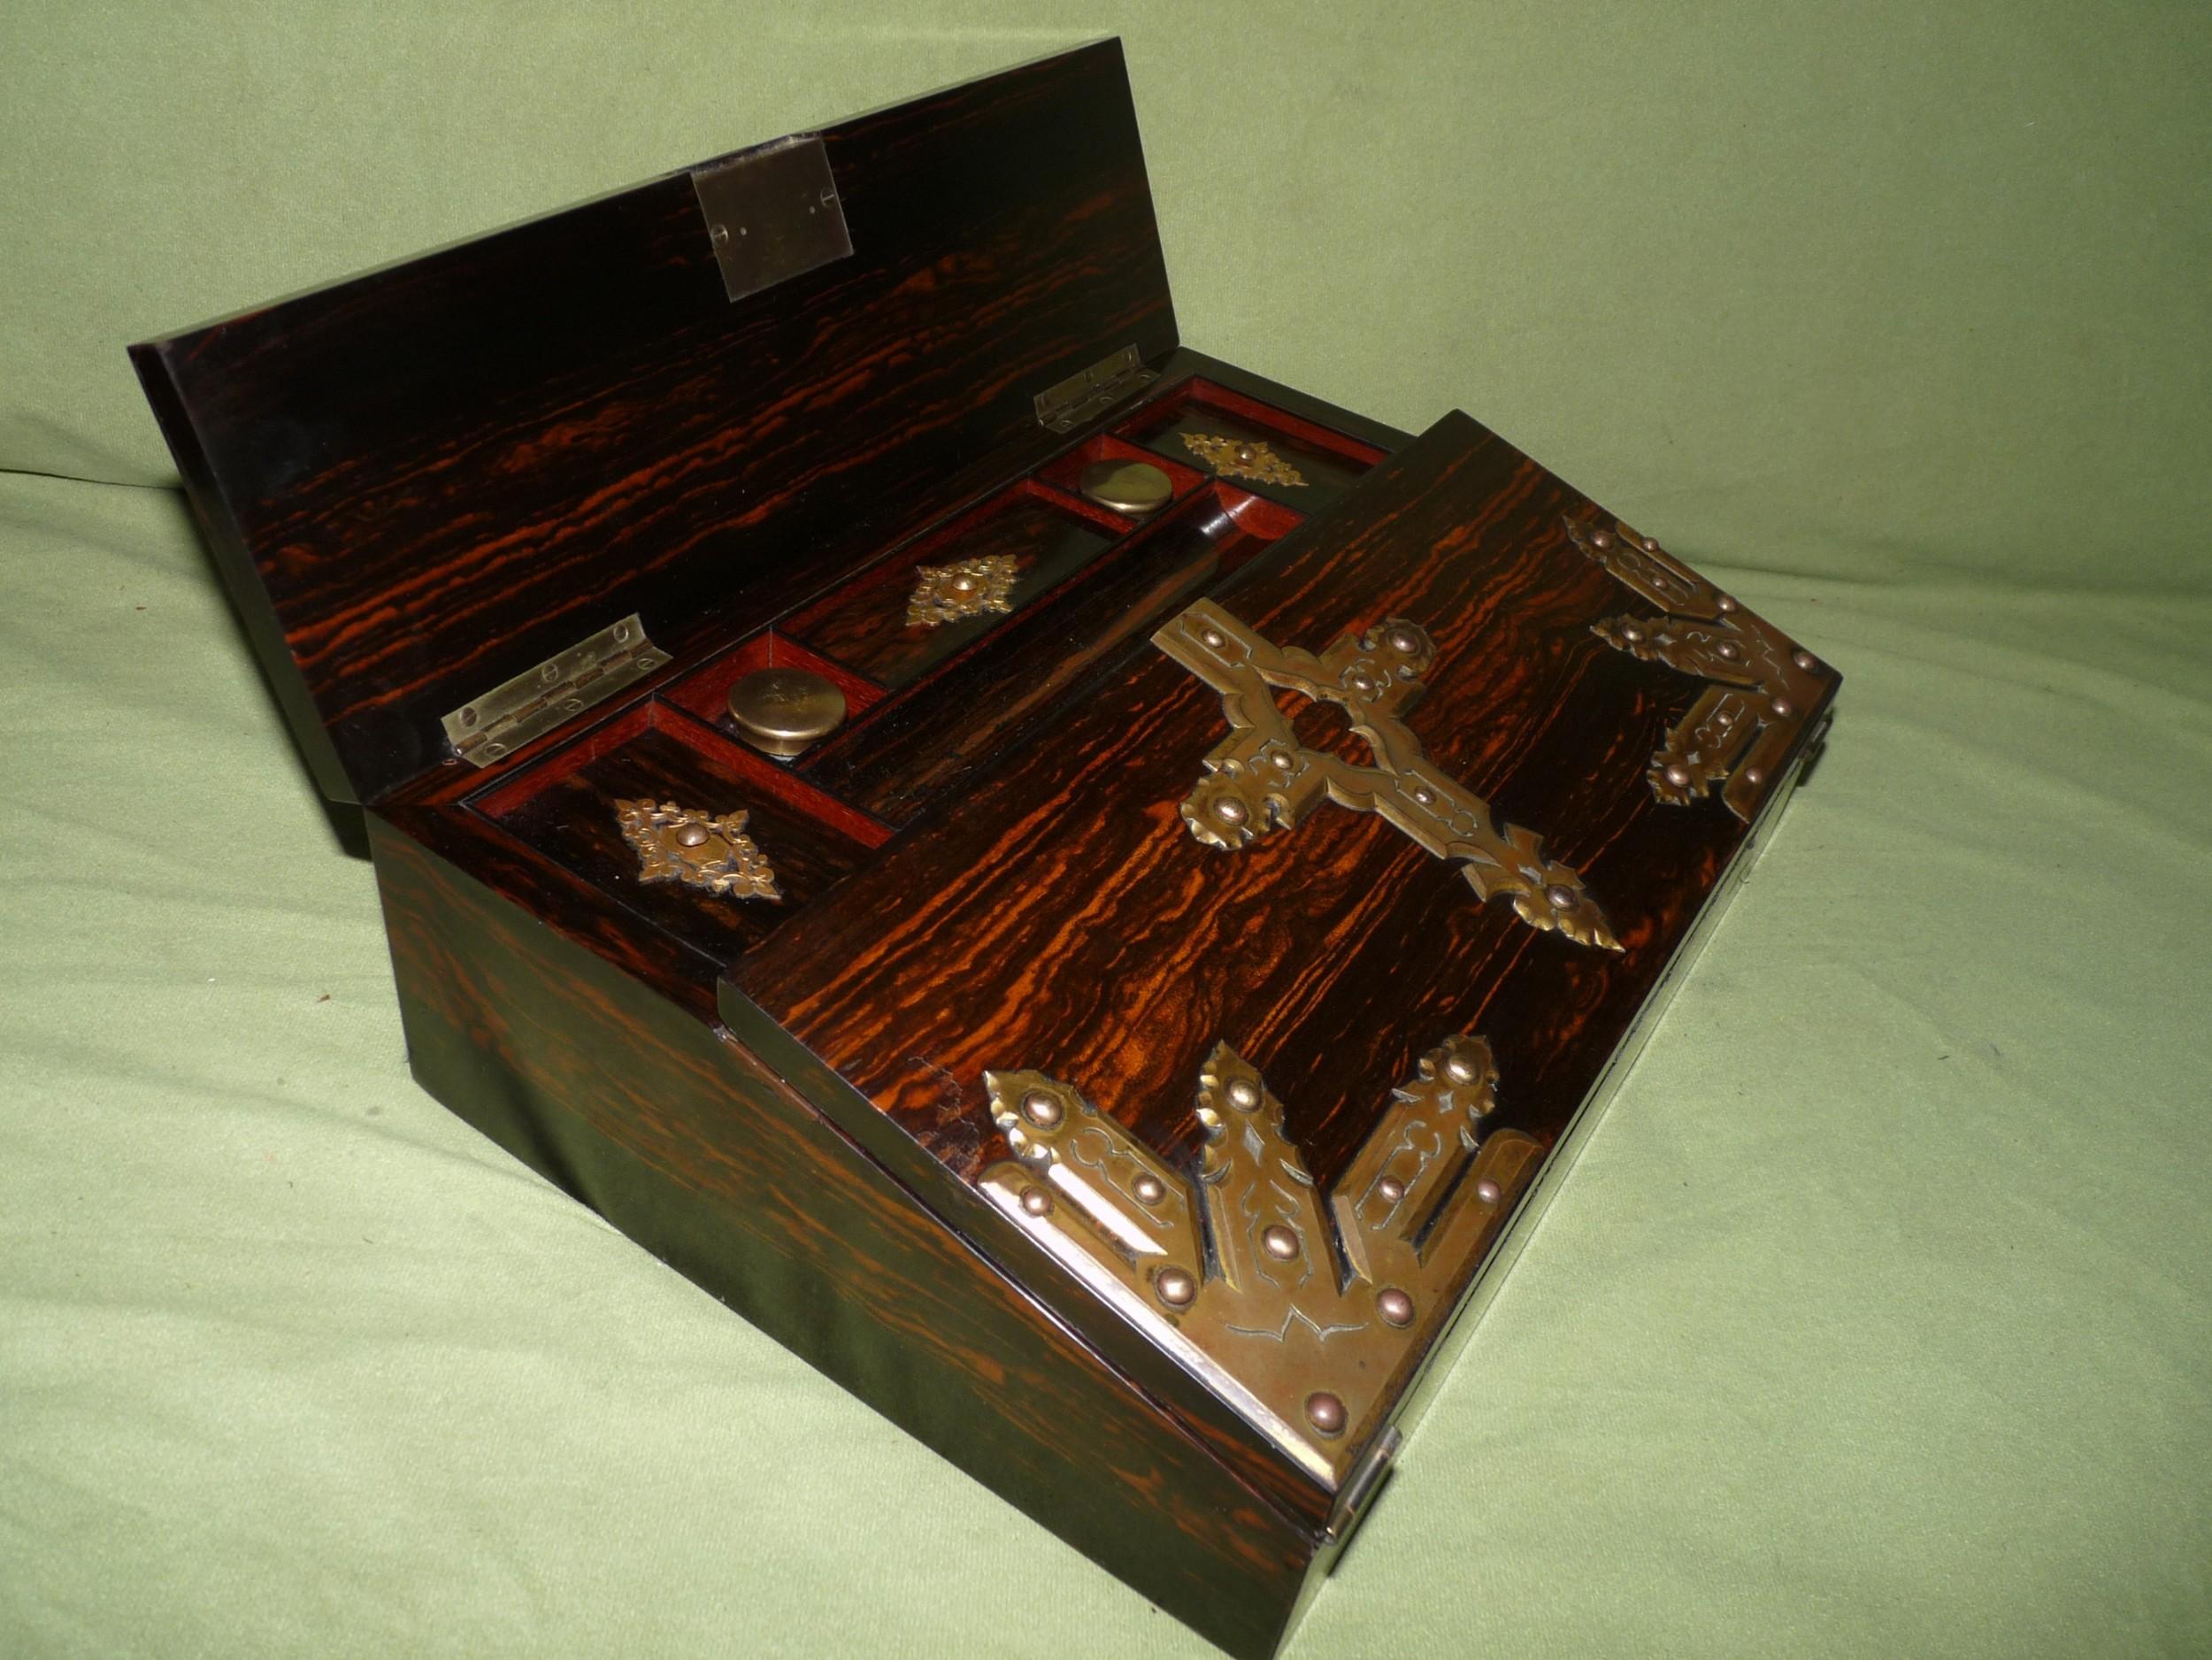 quality betjemann coromandel writing box 100 original c1870